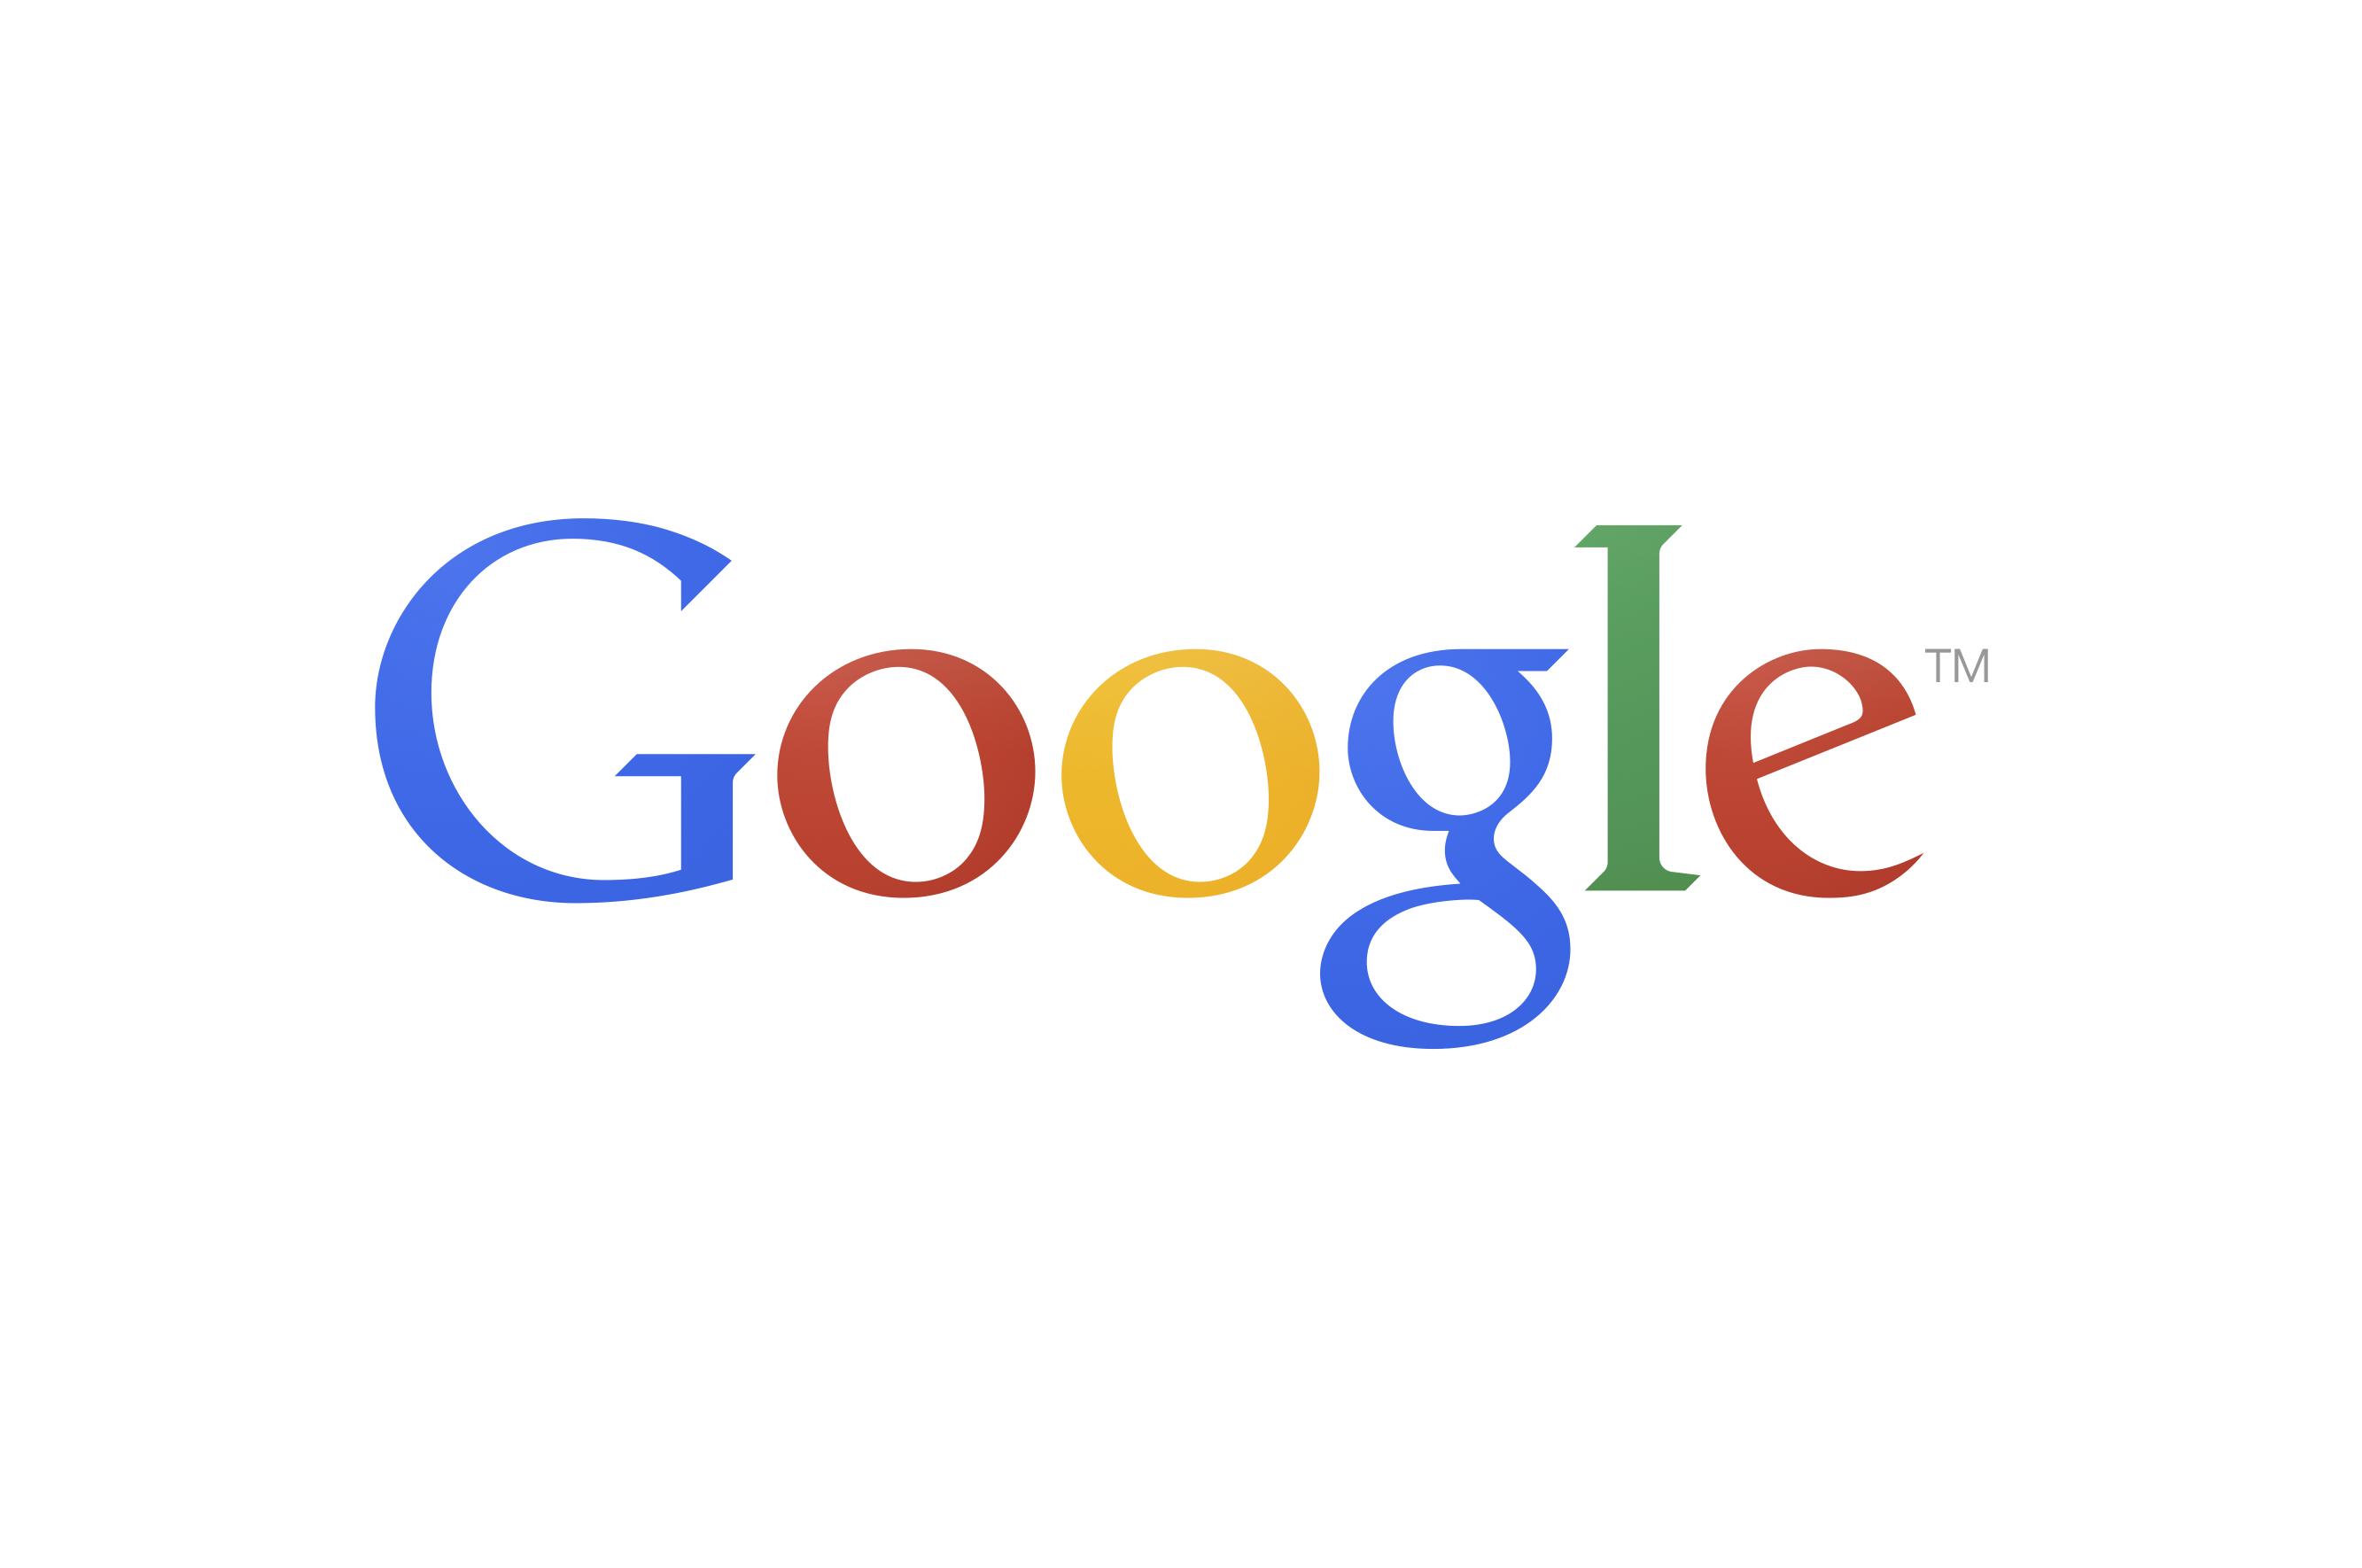 Google-web-logo